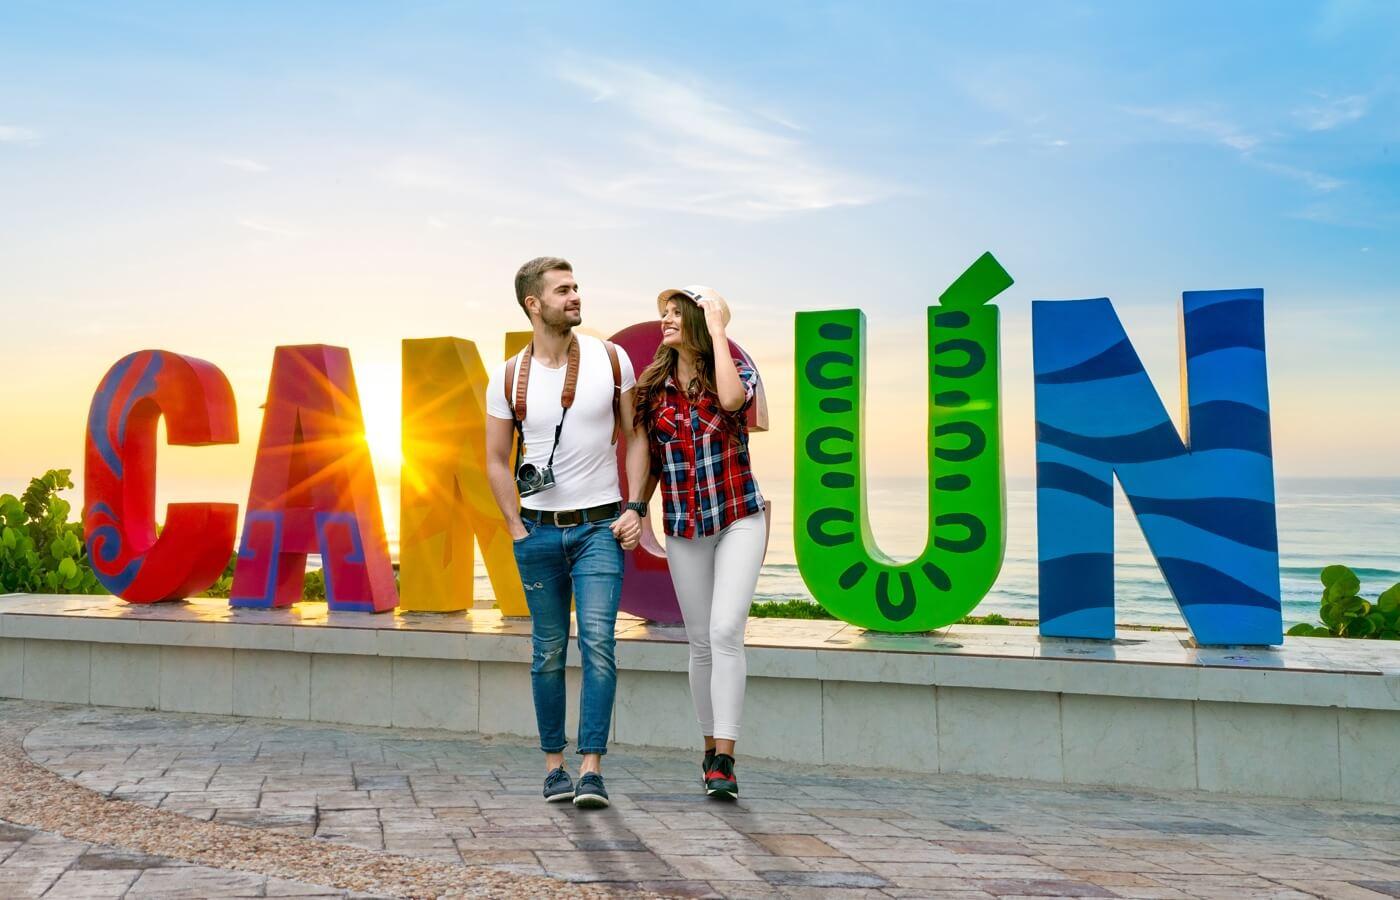 Pareja de turistas frente a letras gigantes de Cancún